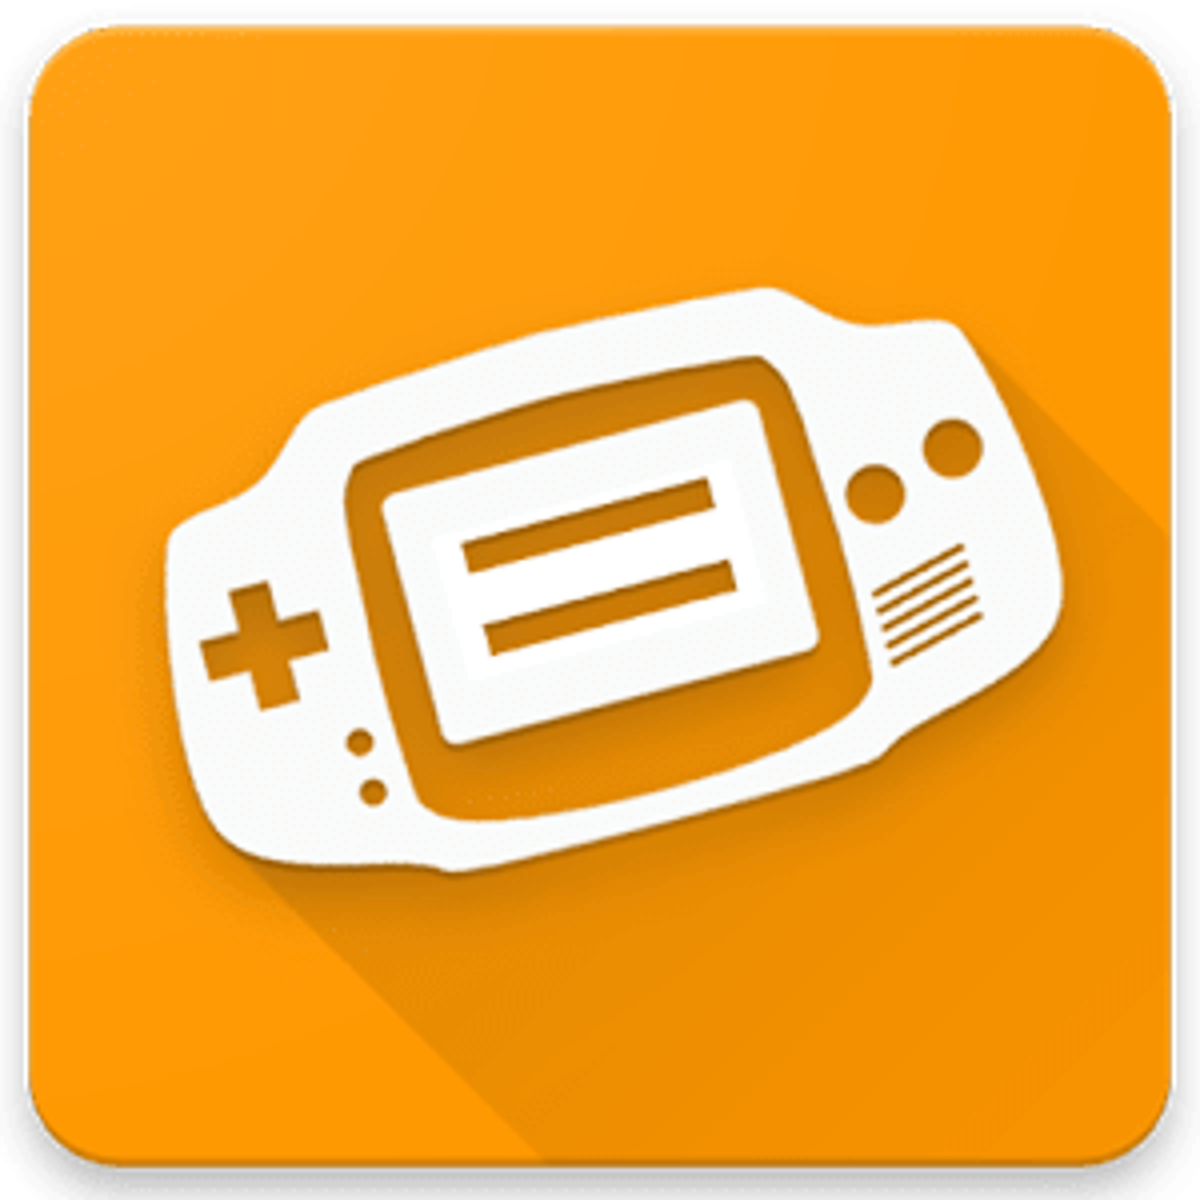 Emulator for GBA Pro Plus 4.0.0